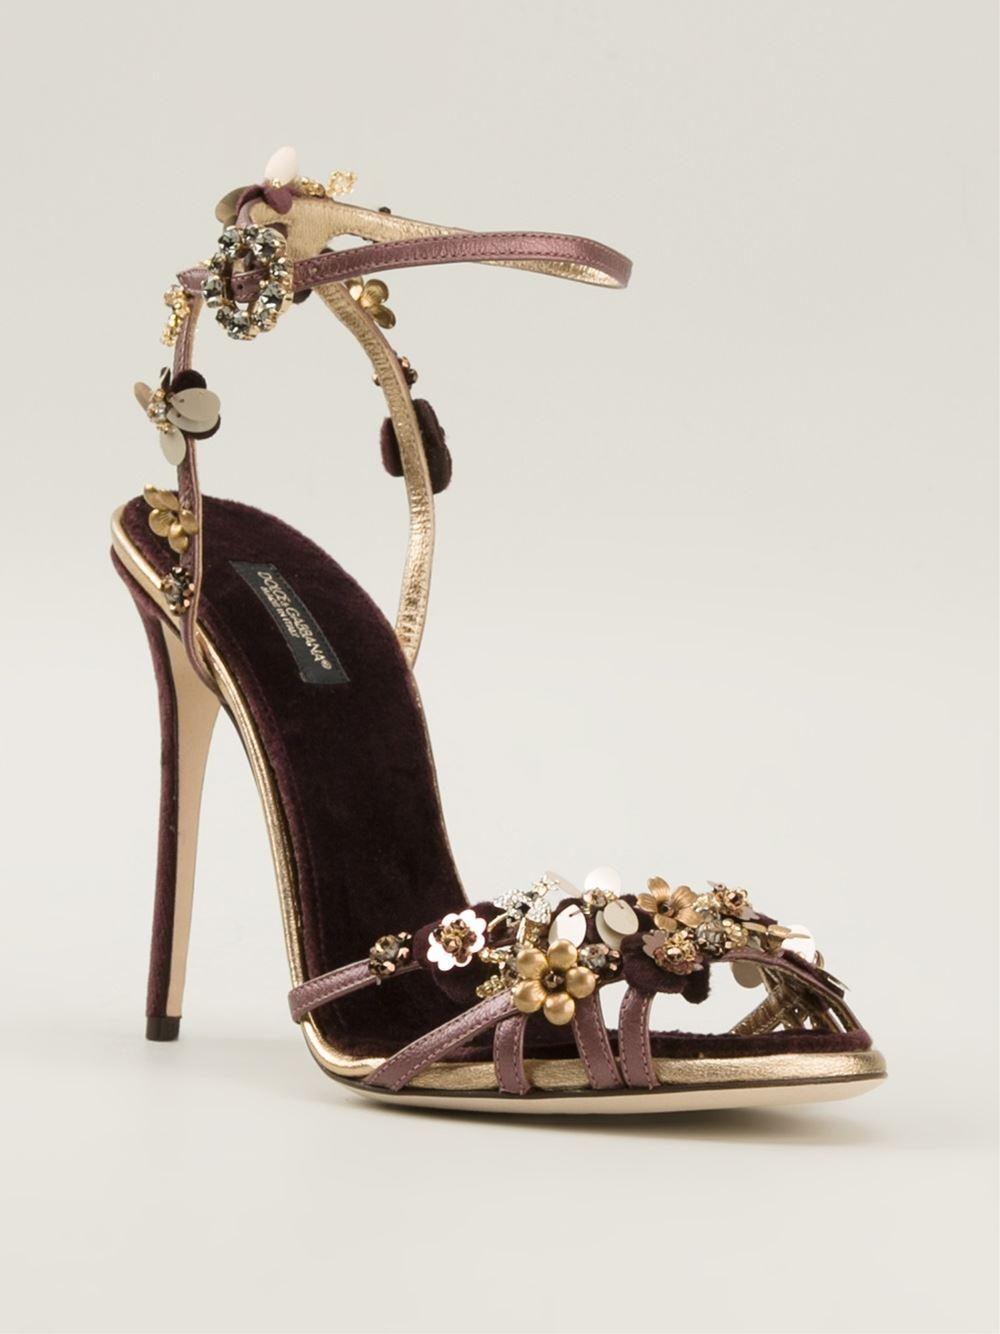 Dolce & Gabbana Strappy Stiletto Heel DJxHYX